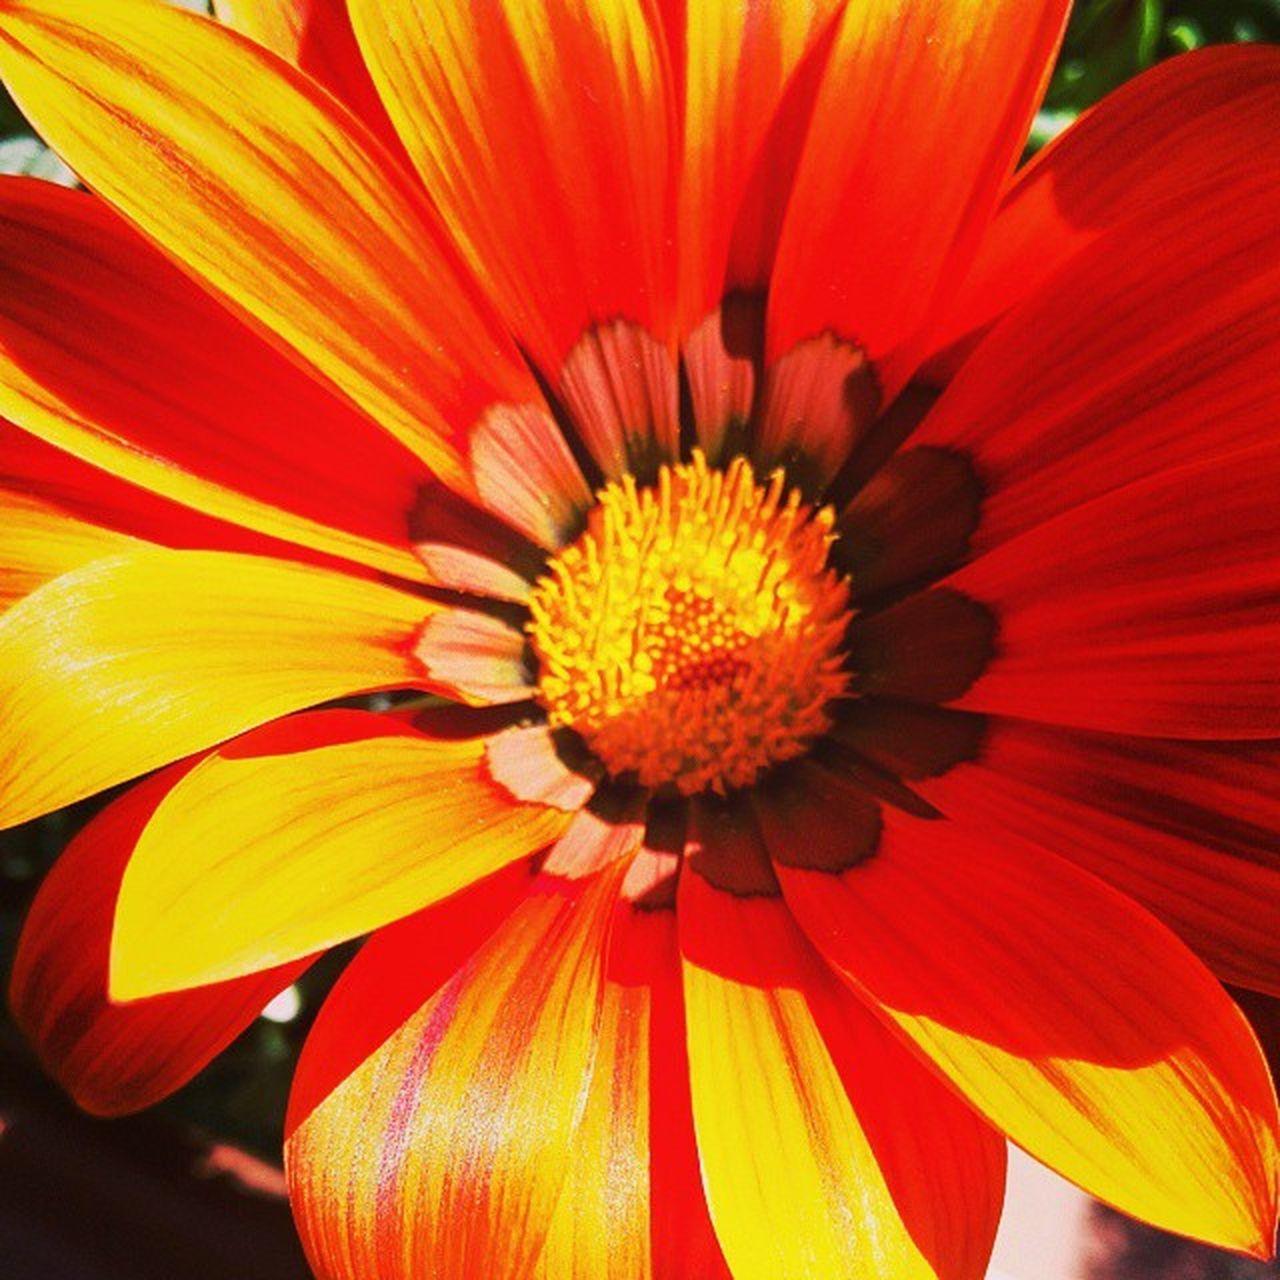 Flowers , Ig_outkast , Petals , Ptk_flowers world_shotz , plants, blossom, instanatura , flowerstagram, flowersofinstagram, flowerstyles_gf, flowerslovers, flowerporn, botanical, insta_pick_blossom, flowermagic, instablooms, floralfix, botanical, floweroftheday ig_week_nature macro_shotz fabshots, fabmacro, macro_perfection, rebelmacro, ic_macro, nature_wizards macro_aroundworld, bns_flowers spring